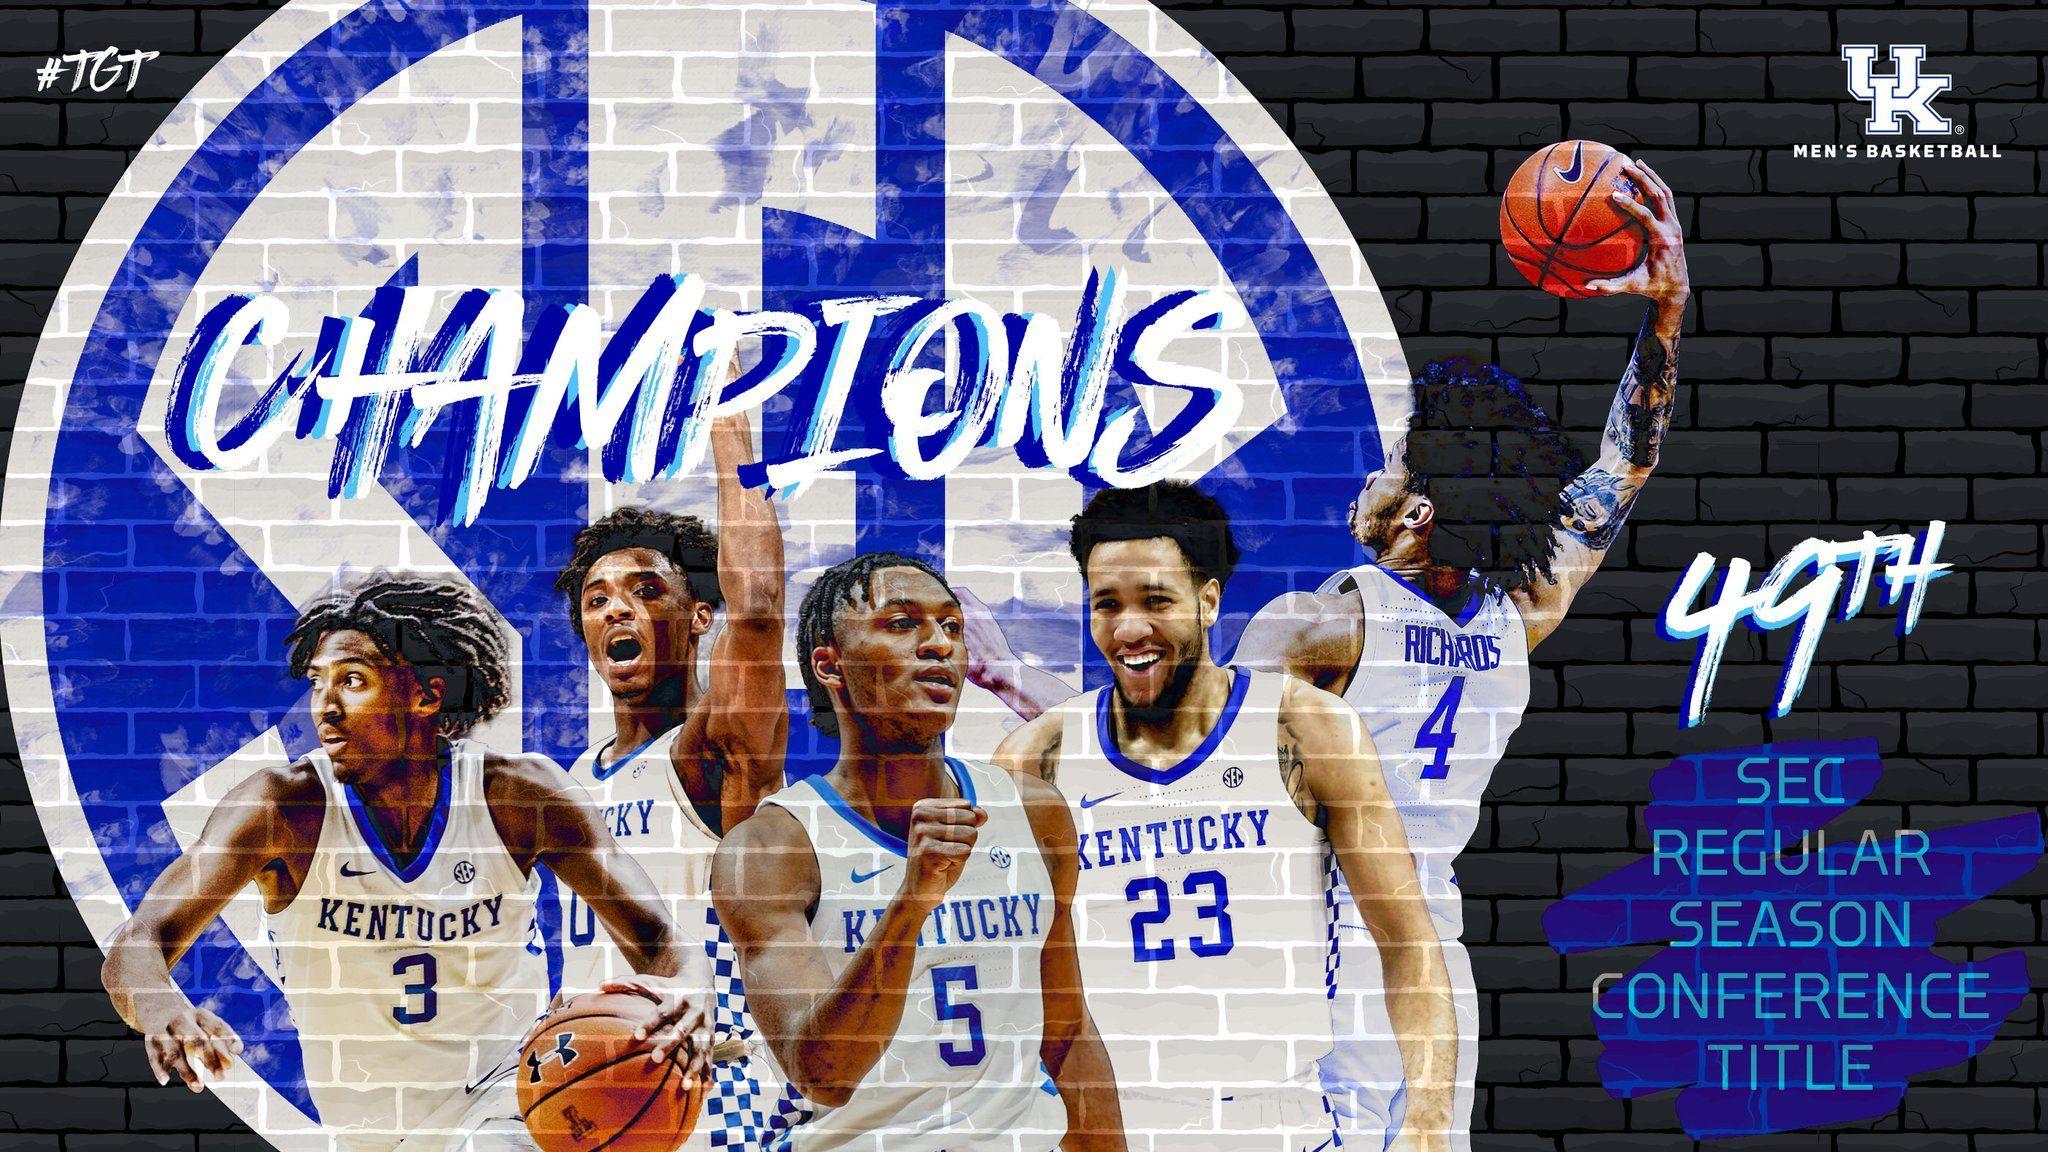 Kentucky Basketball On Twitter In 2020 Kentucky Kentucky Basketball Kentucky Wildcats Basketball